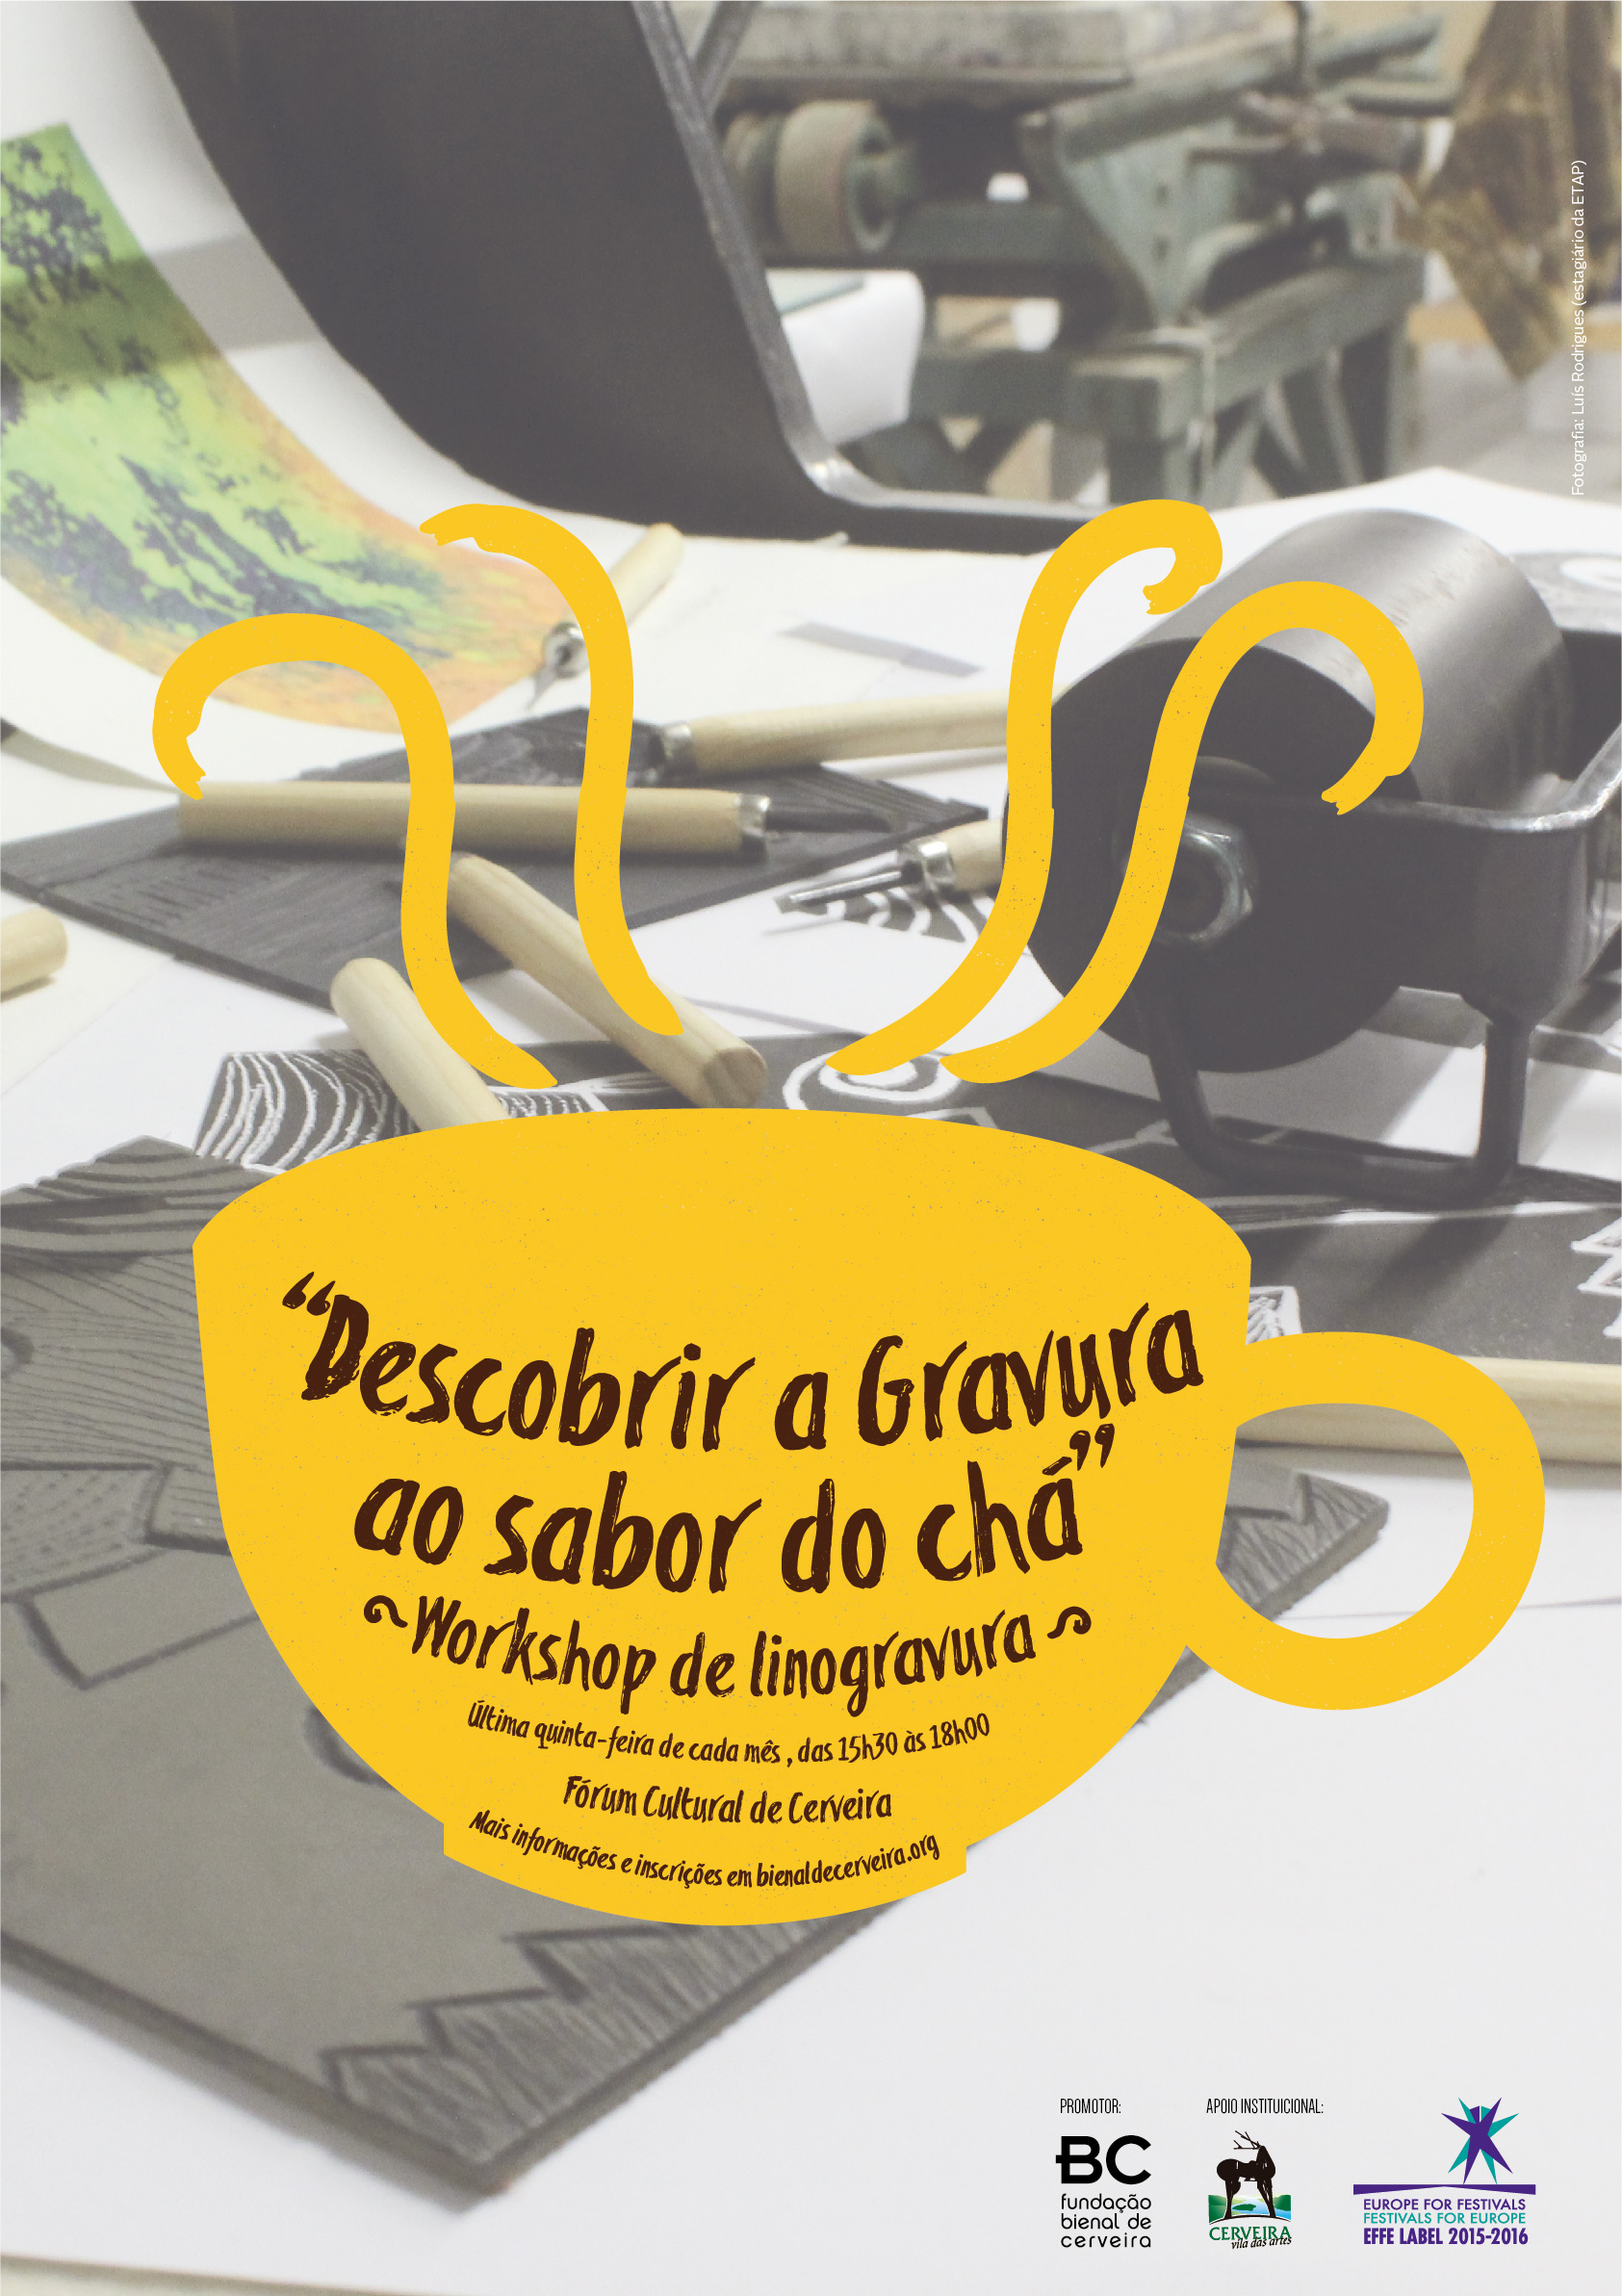 descobrir_gravura_sabor_cha